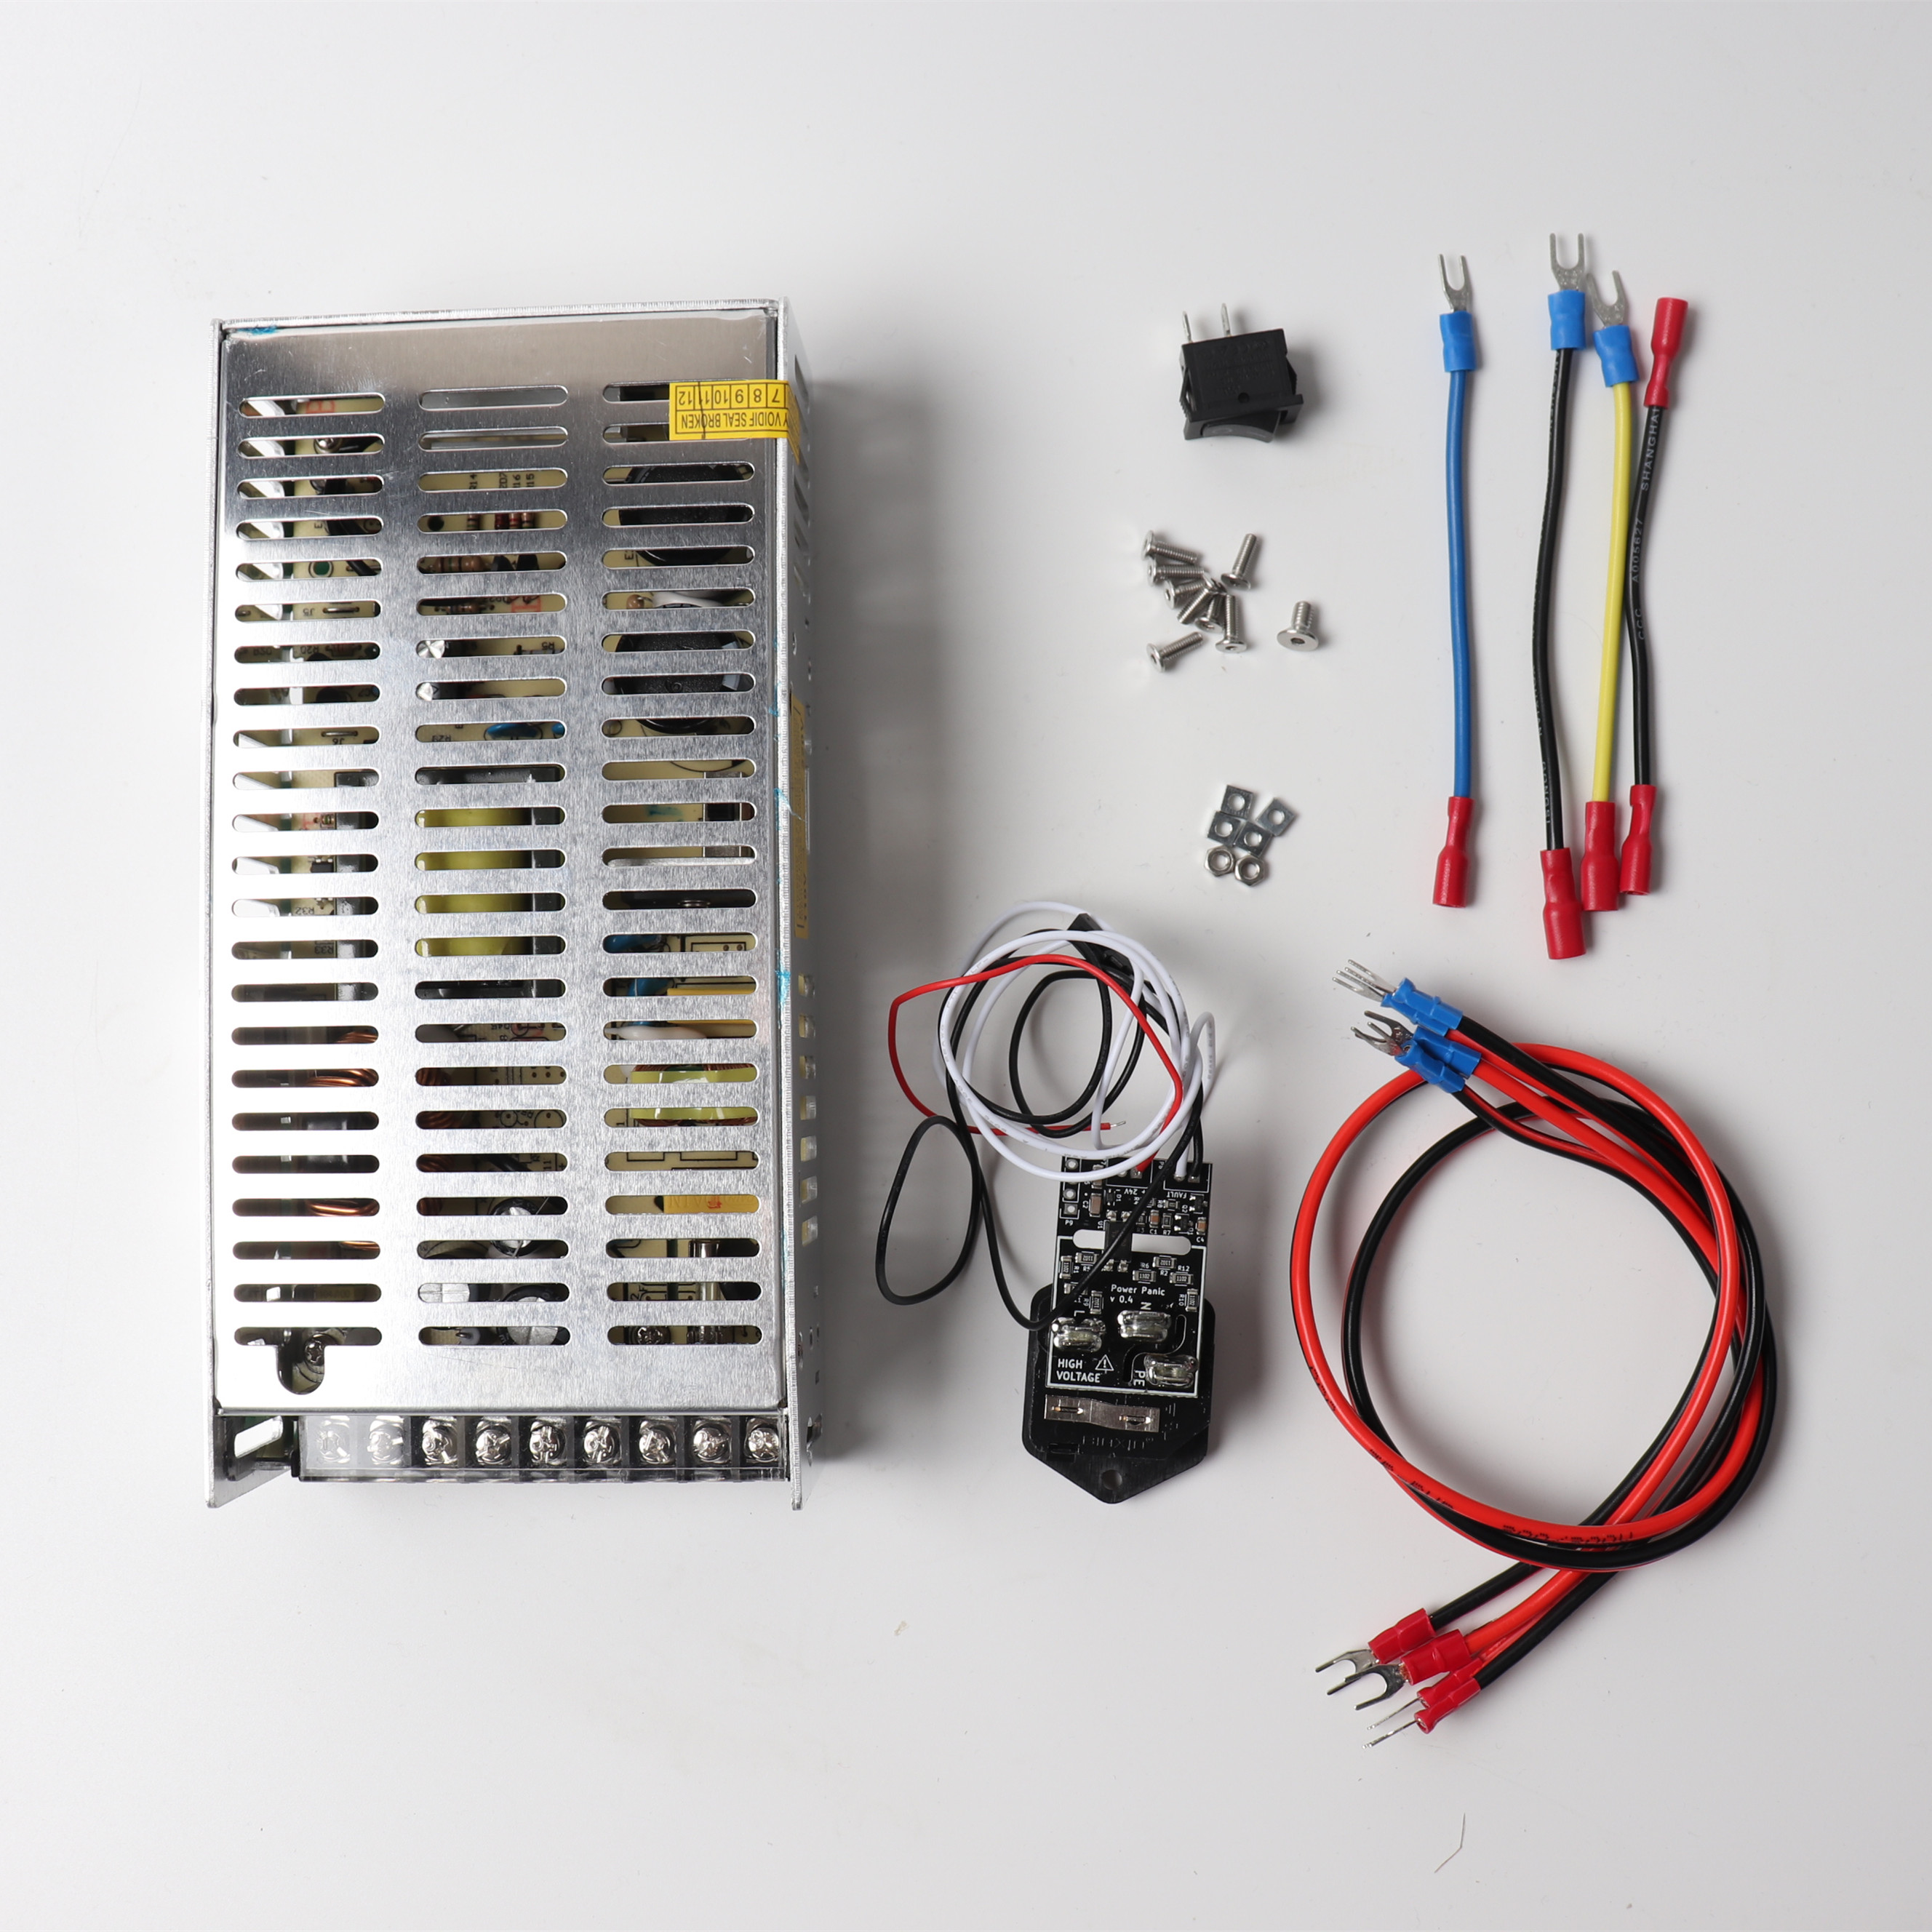 Blurolls Prusa i3 MK3 PSU power supply 24V 24W power panic wiring harness and switch